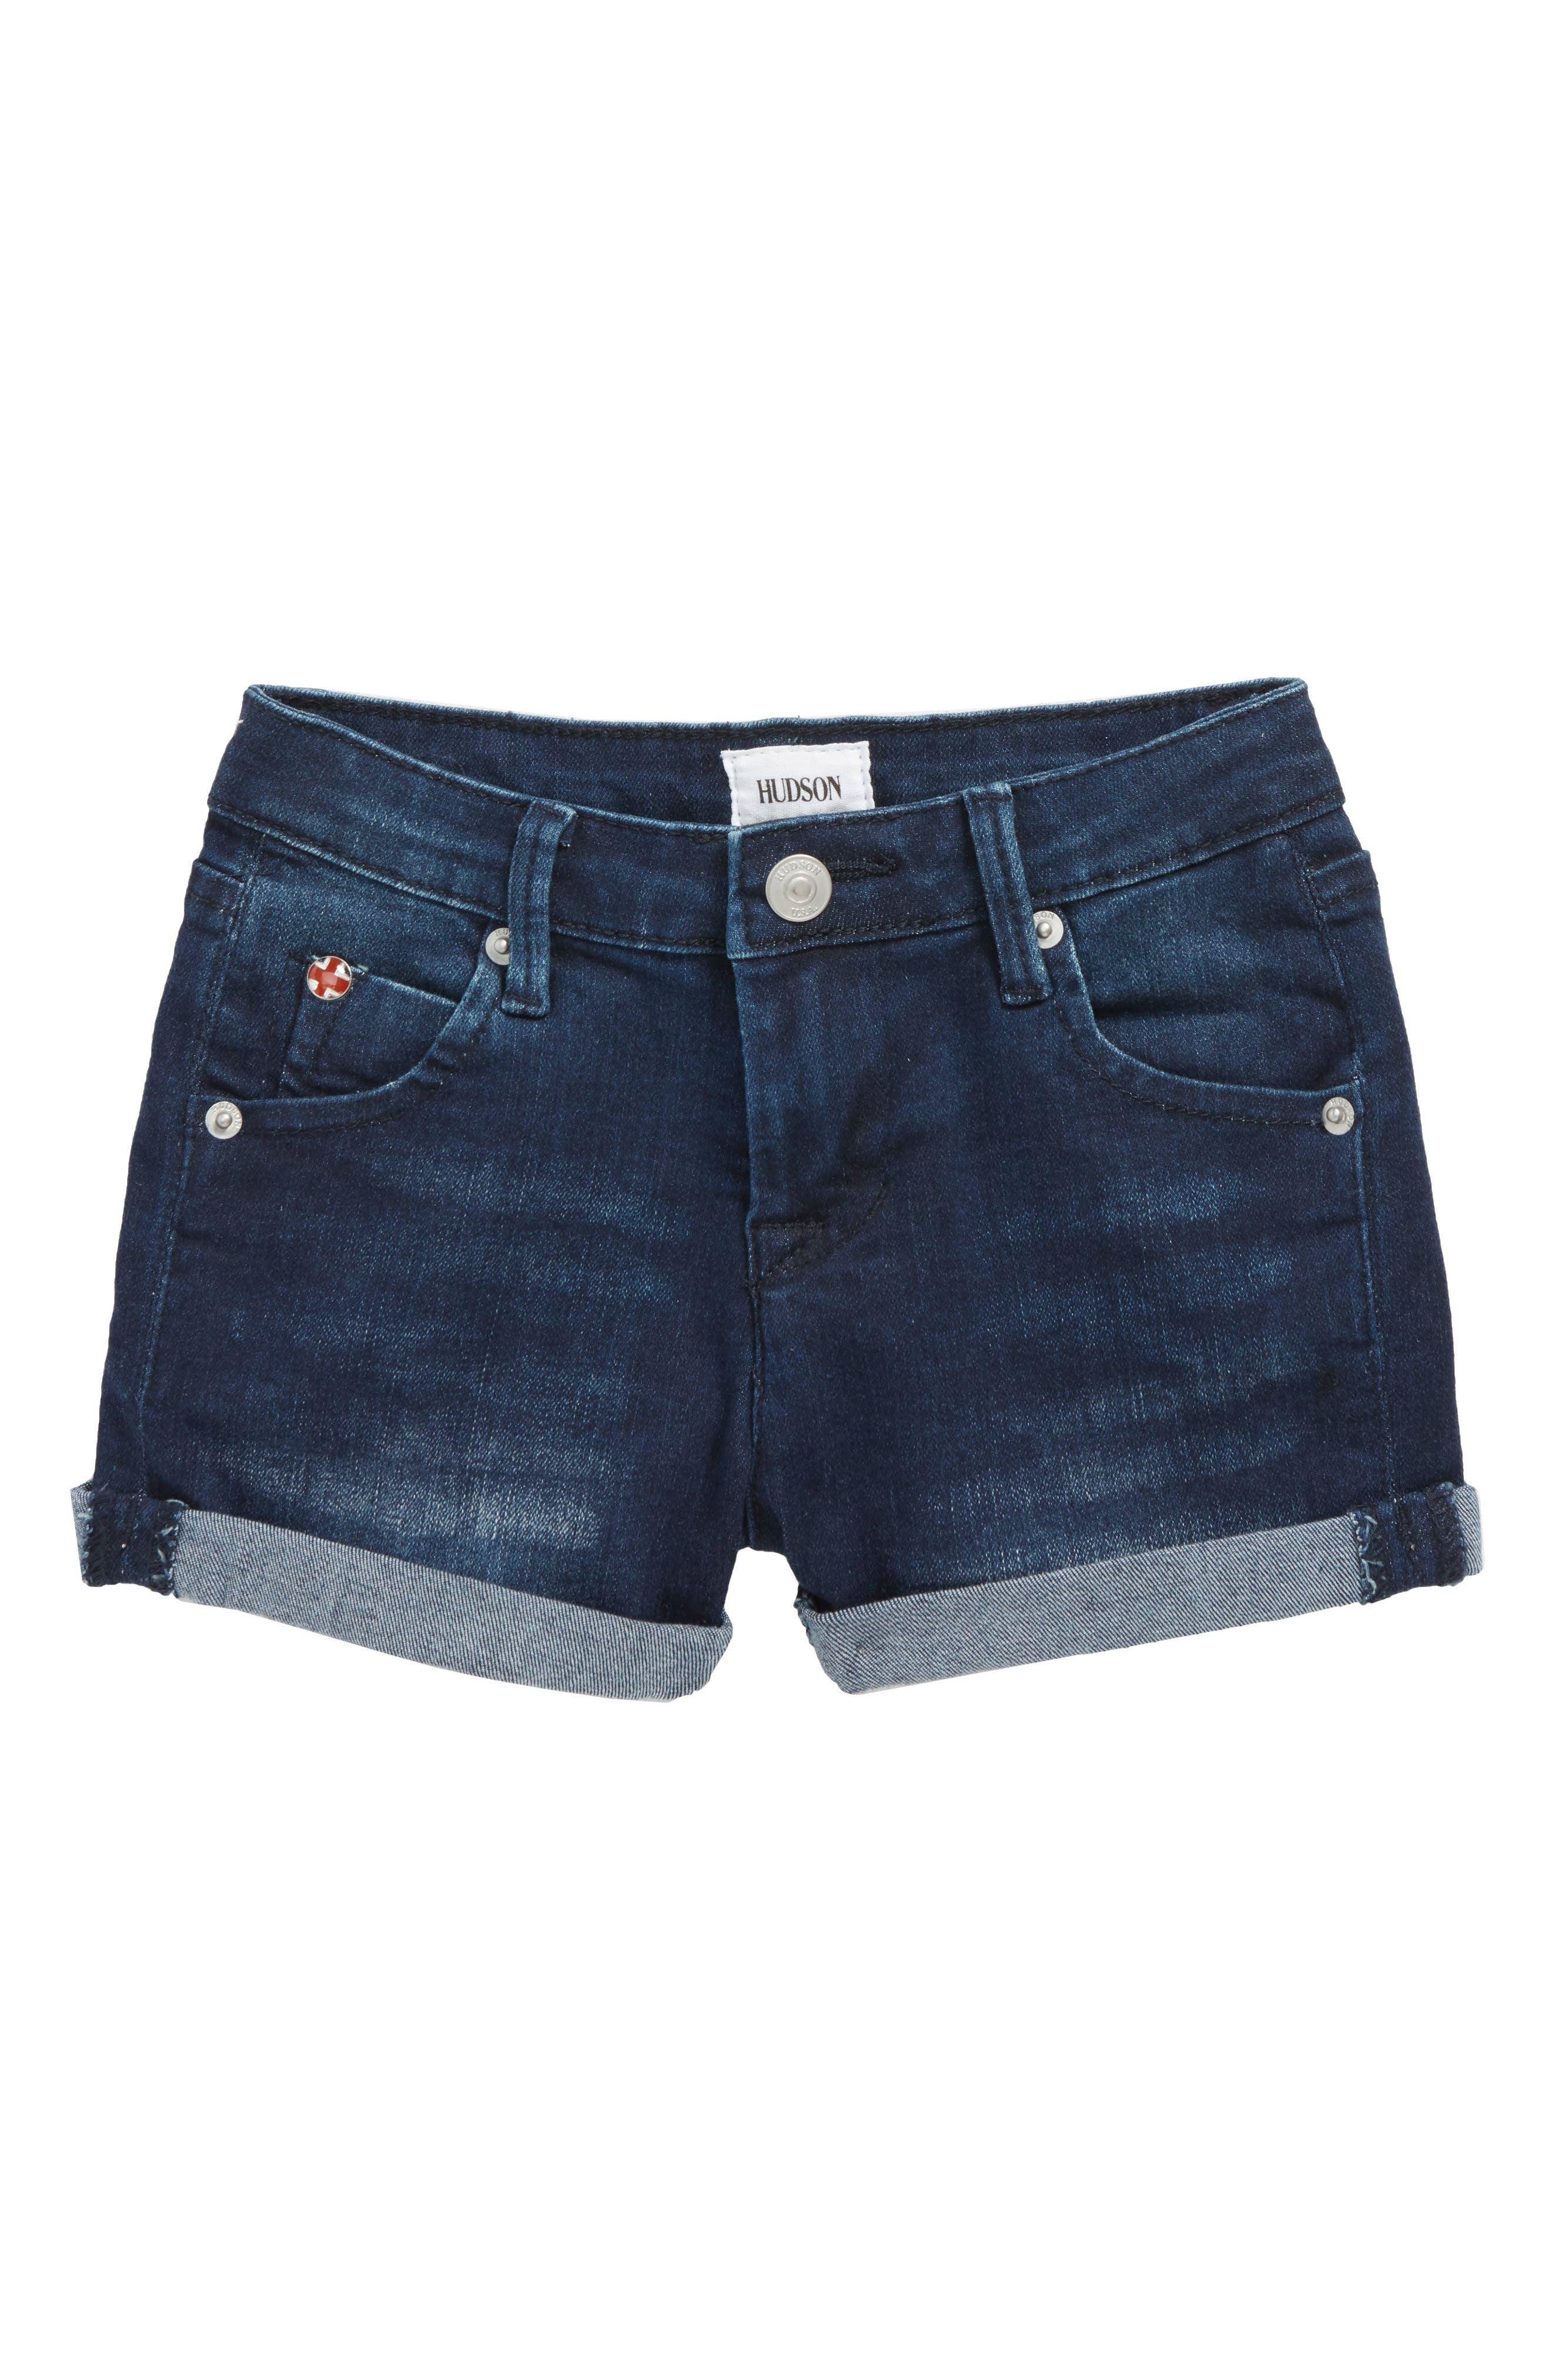 Roll Cuff Denim Shorts,                             Main thumbnail 1, color,                             Low Octane Blue